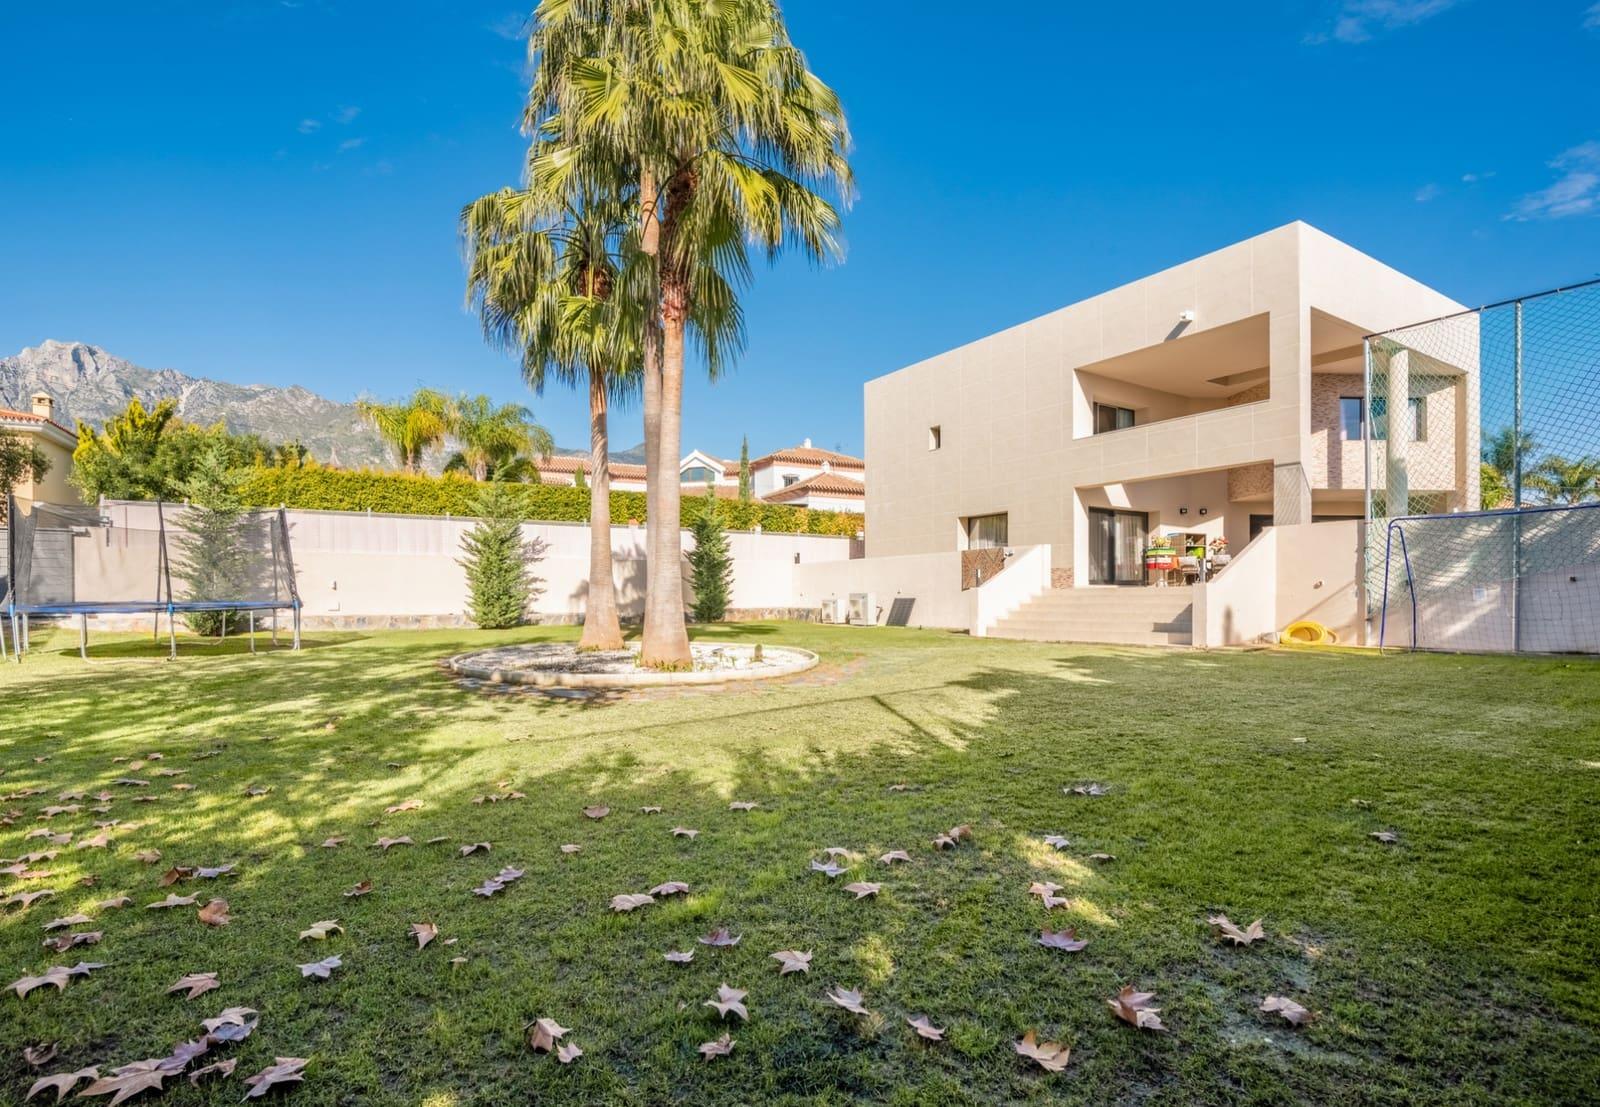 5 bedroom Villa for sale in Marbella with pool - € 1,375,000 (Ref: 4694395)